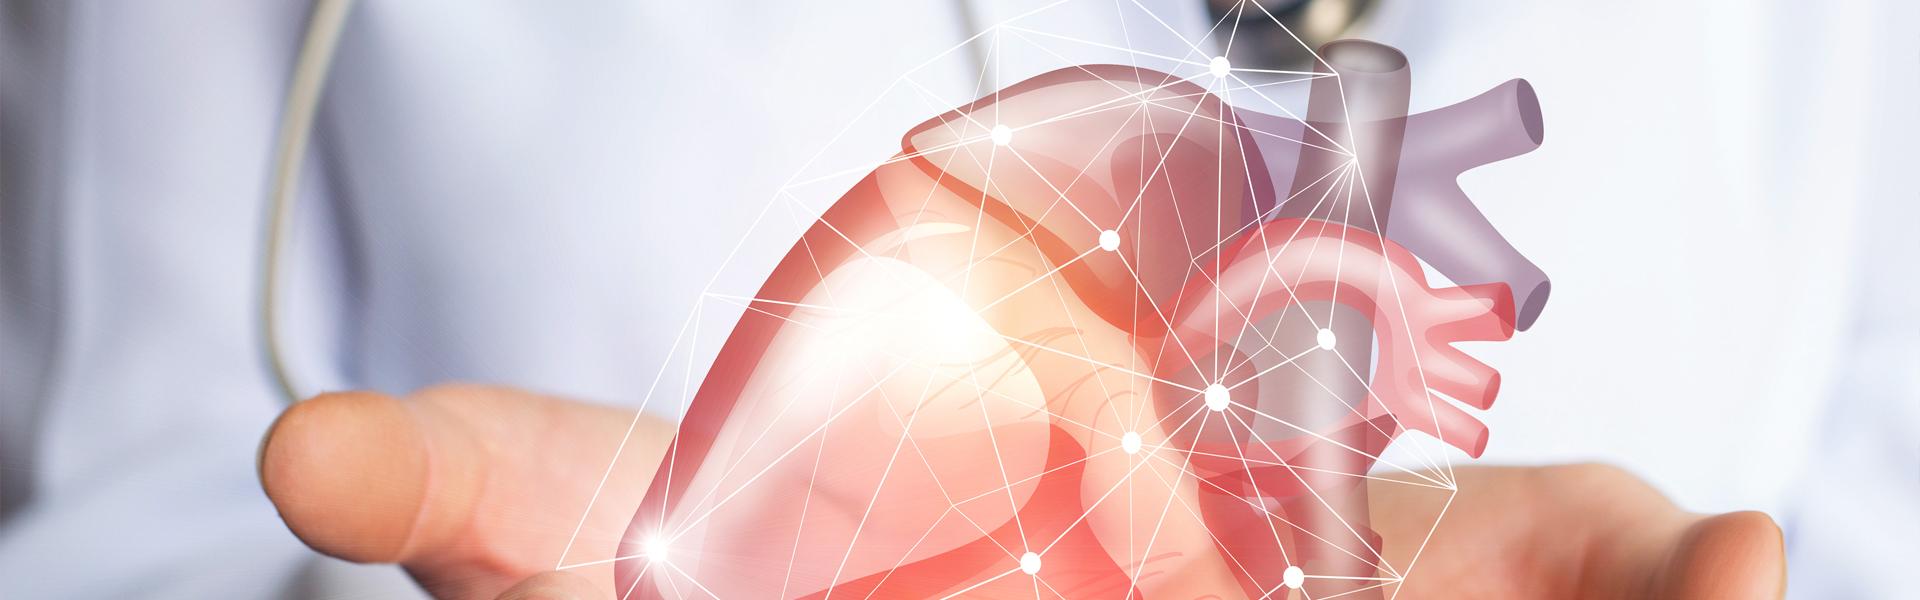 Digital Cardiology Banner